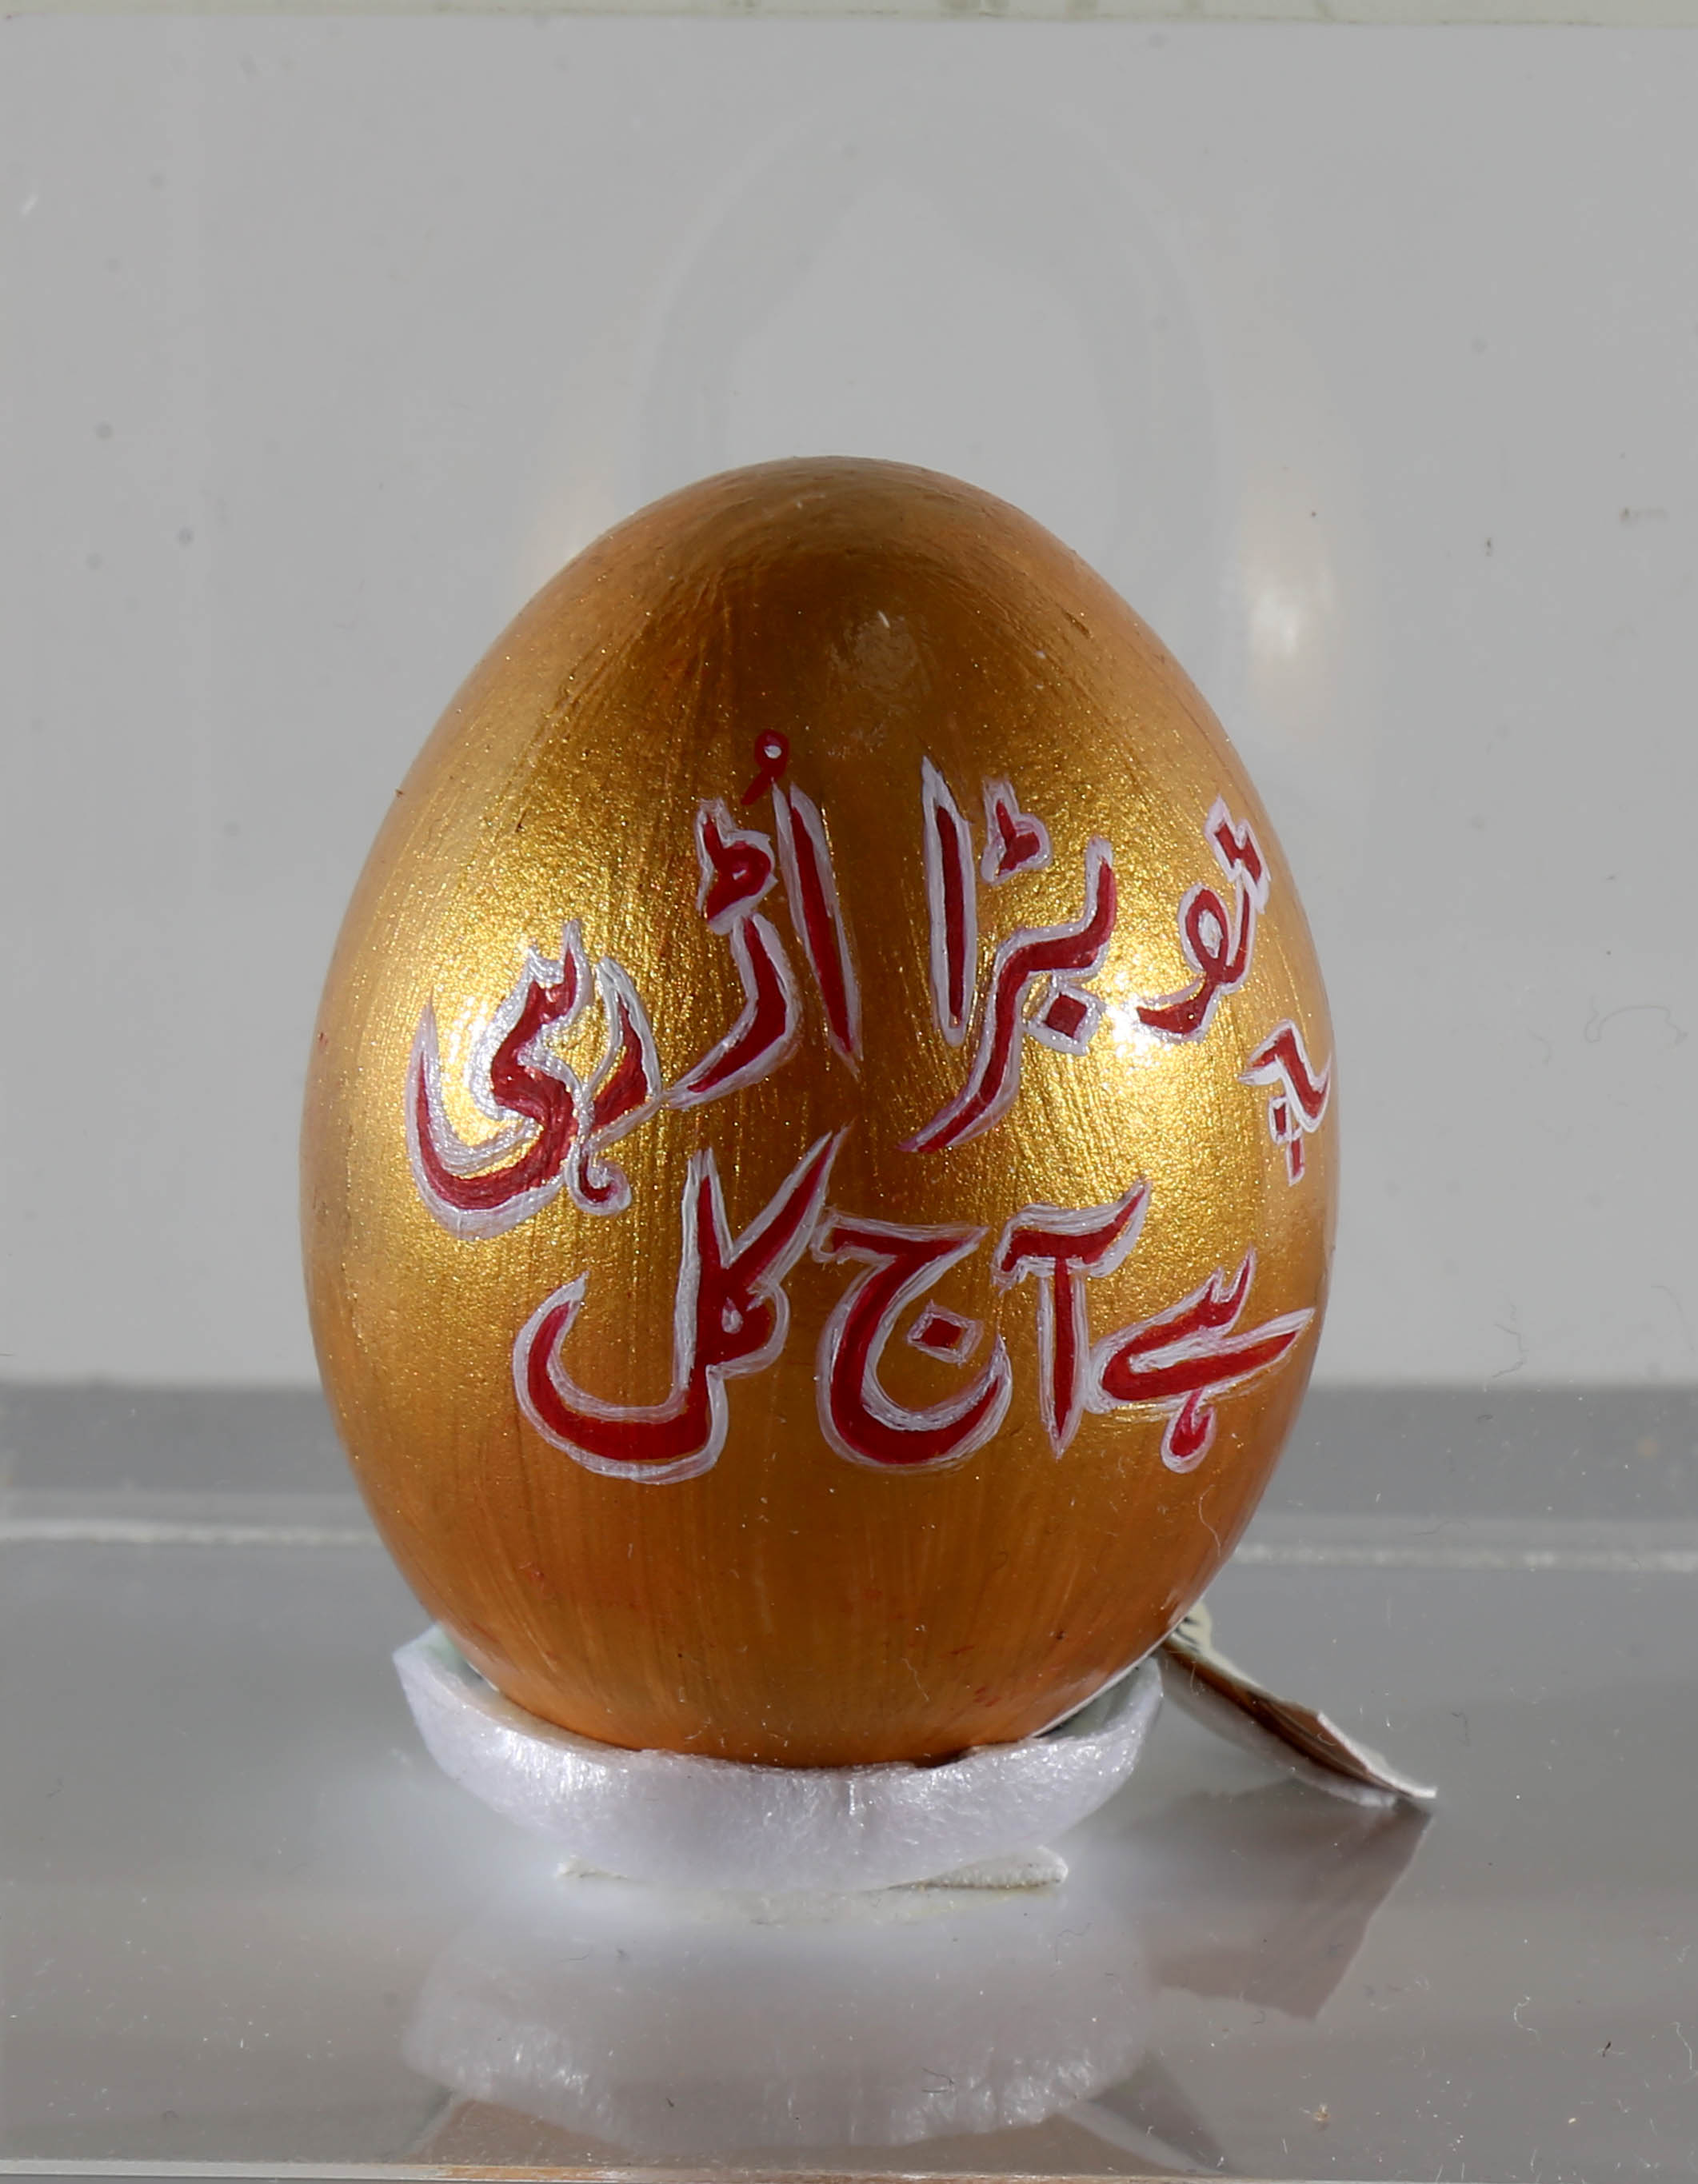 Urdu phrase painted on an eggshell